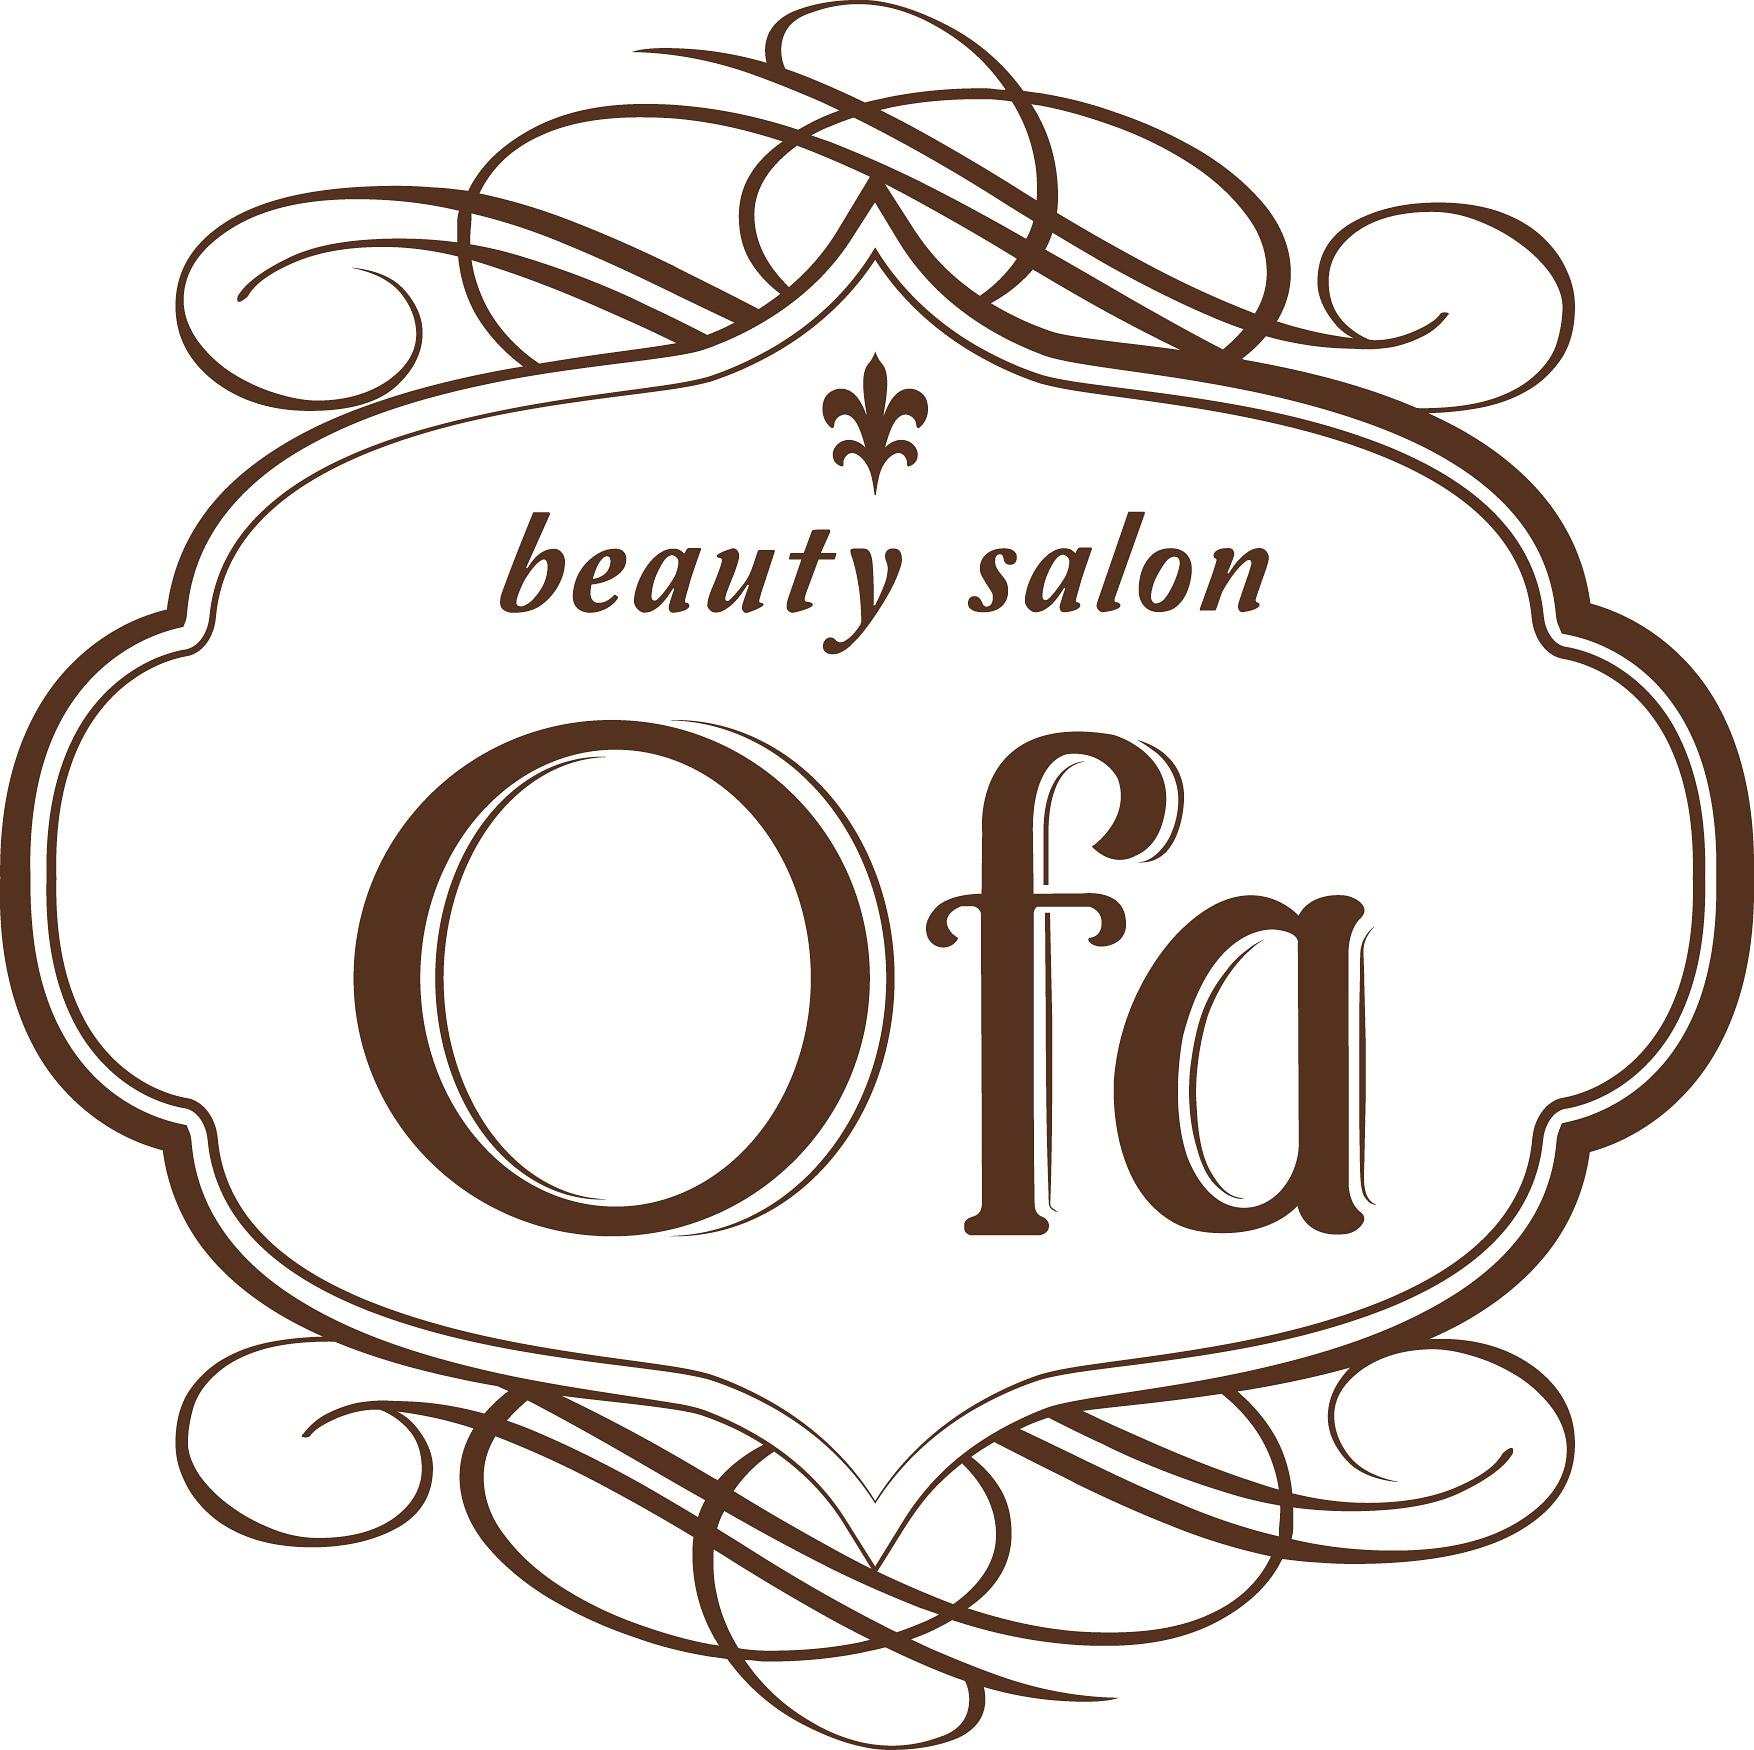 Ofaのロゴ